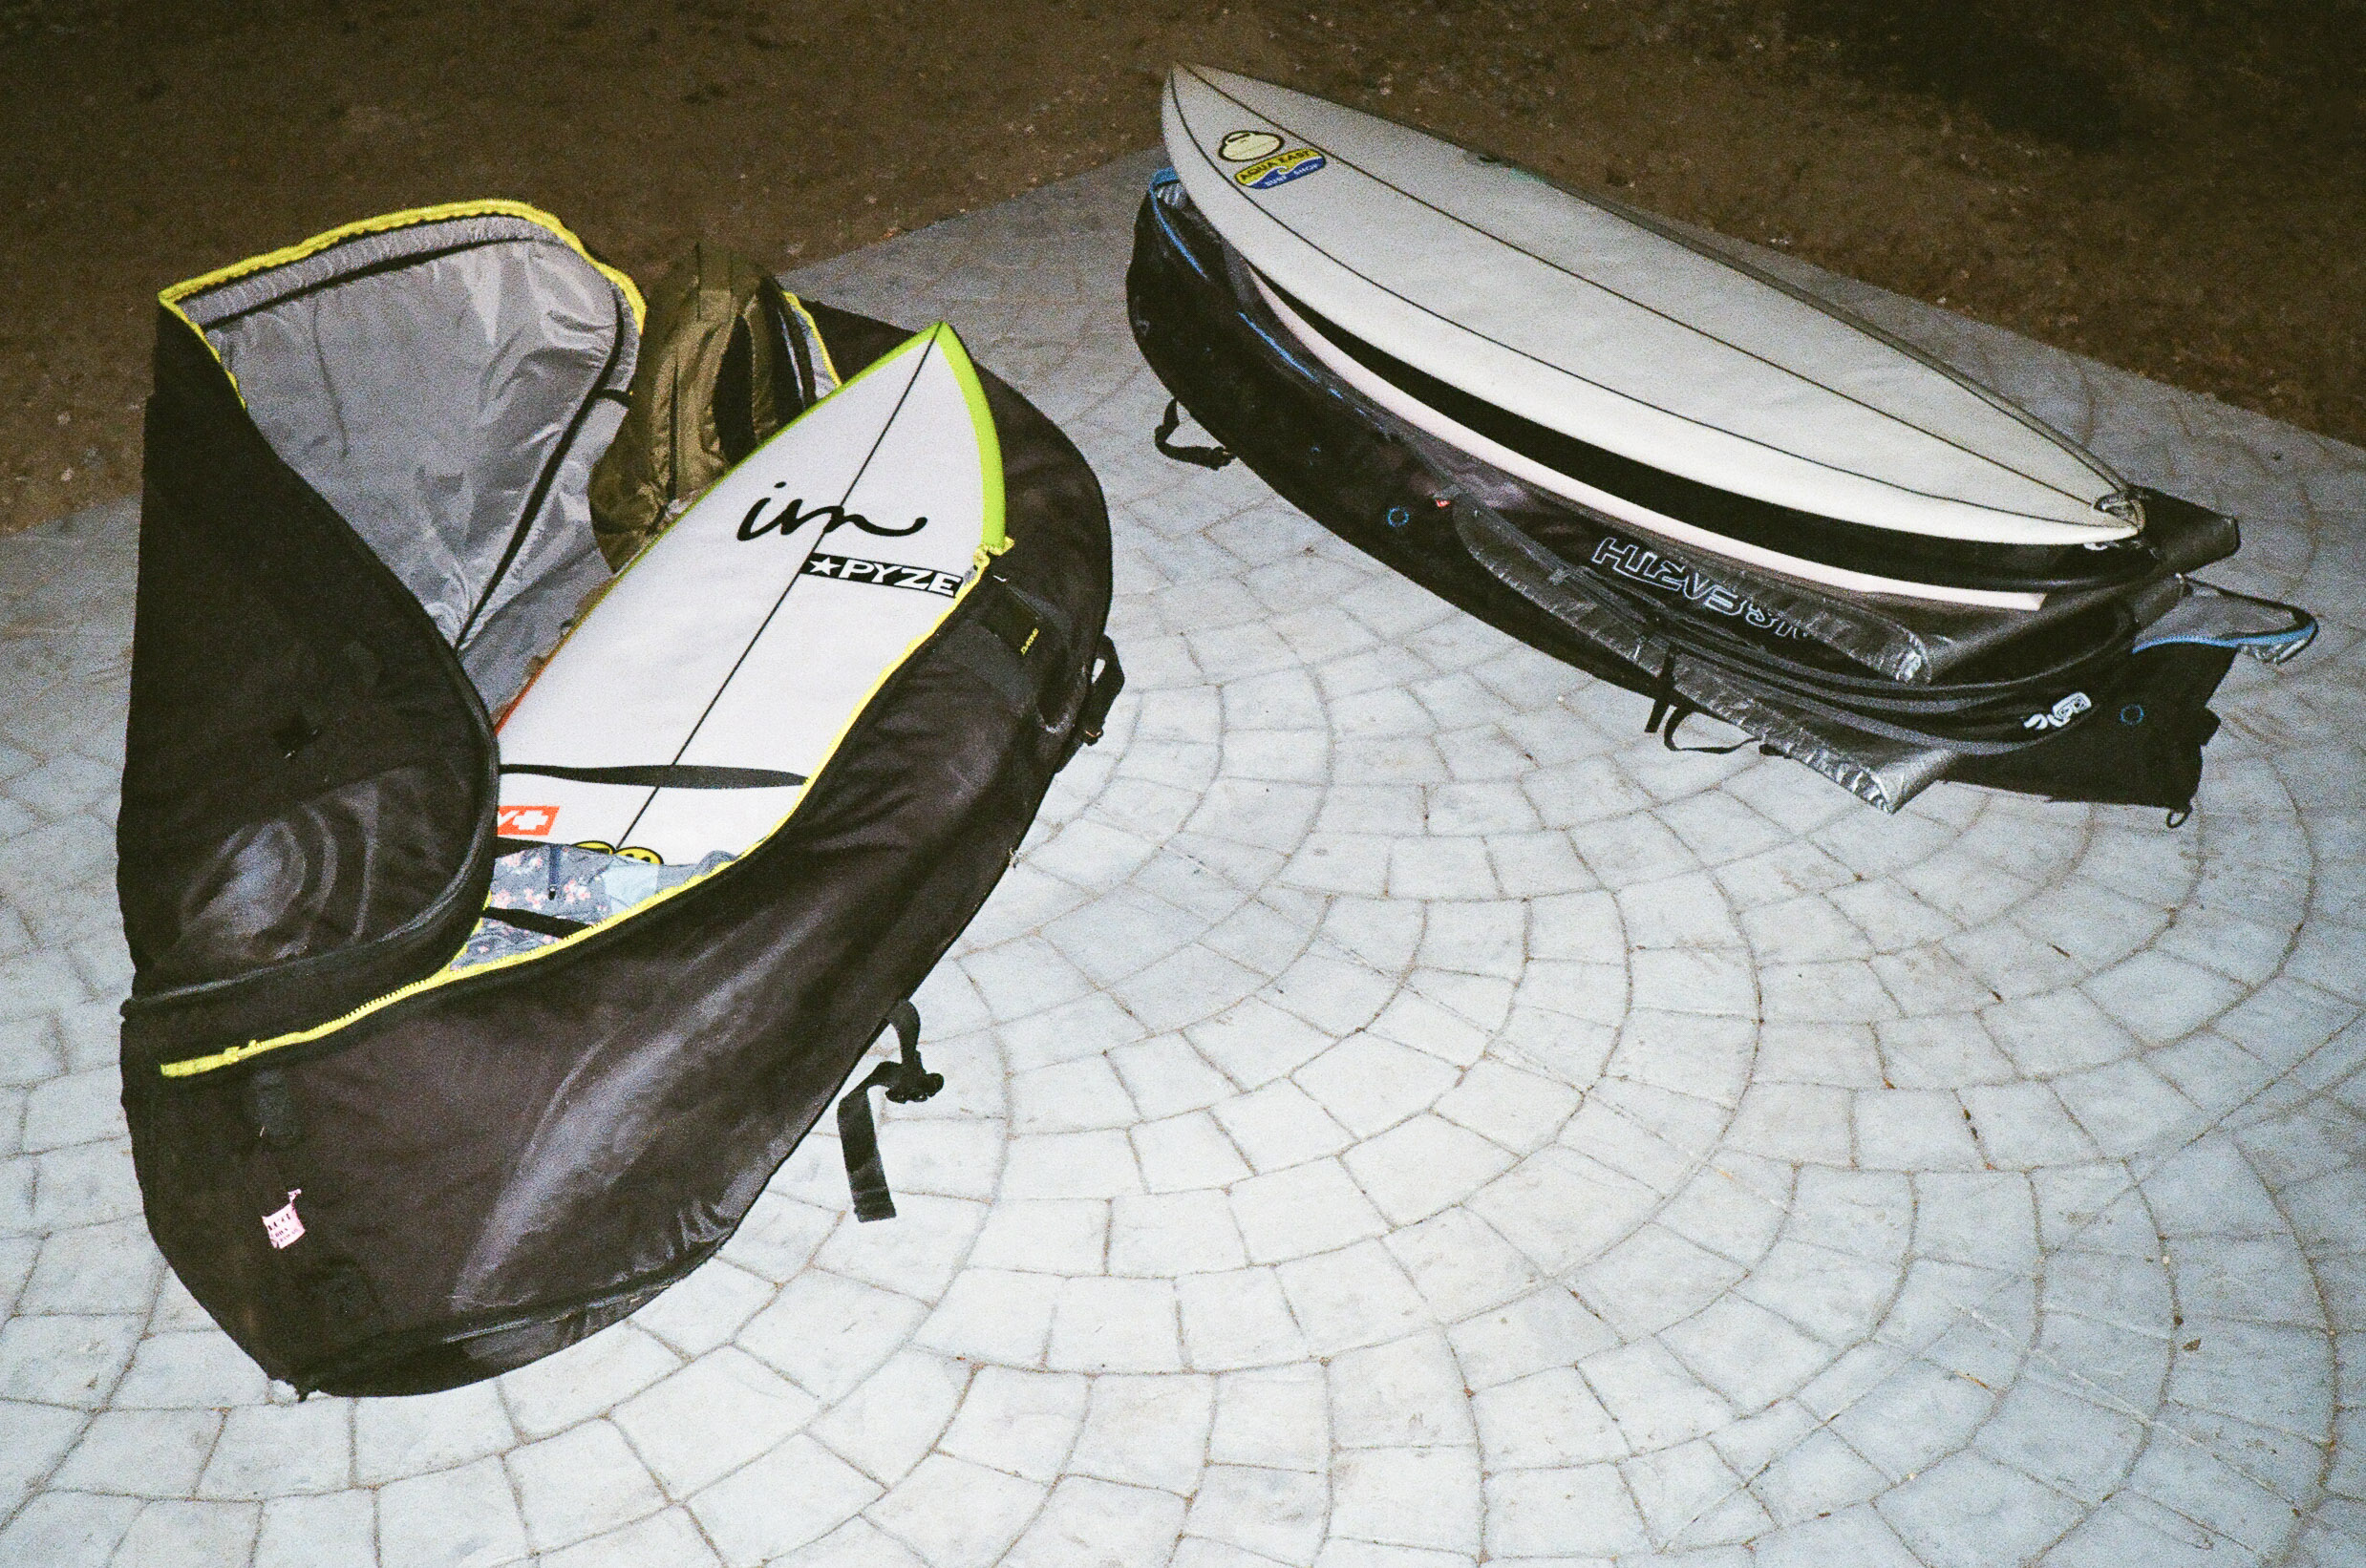 captainbarto-blog-adambartoshesky-model-nautica-client-mexico-surf-trip-mexican-mirage-september-2018-2.jpg